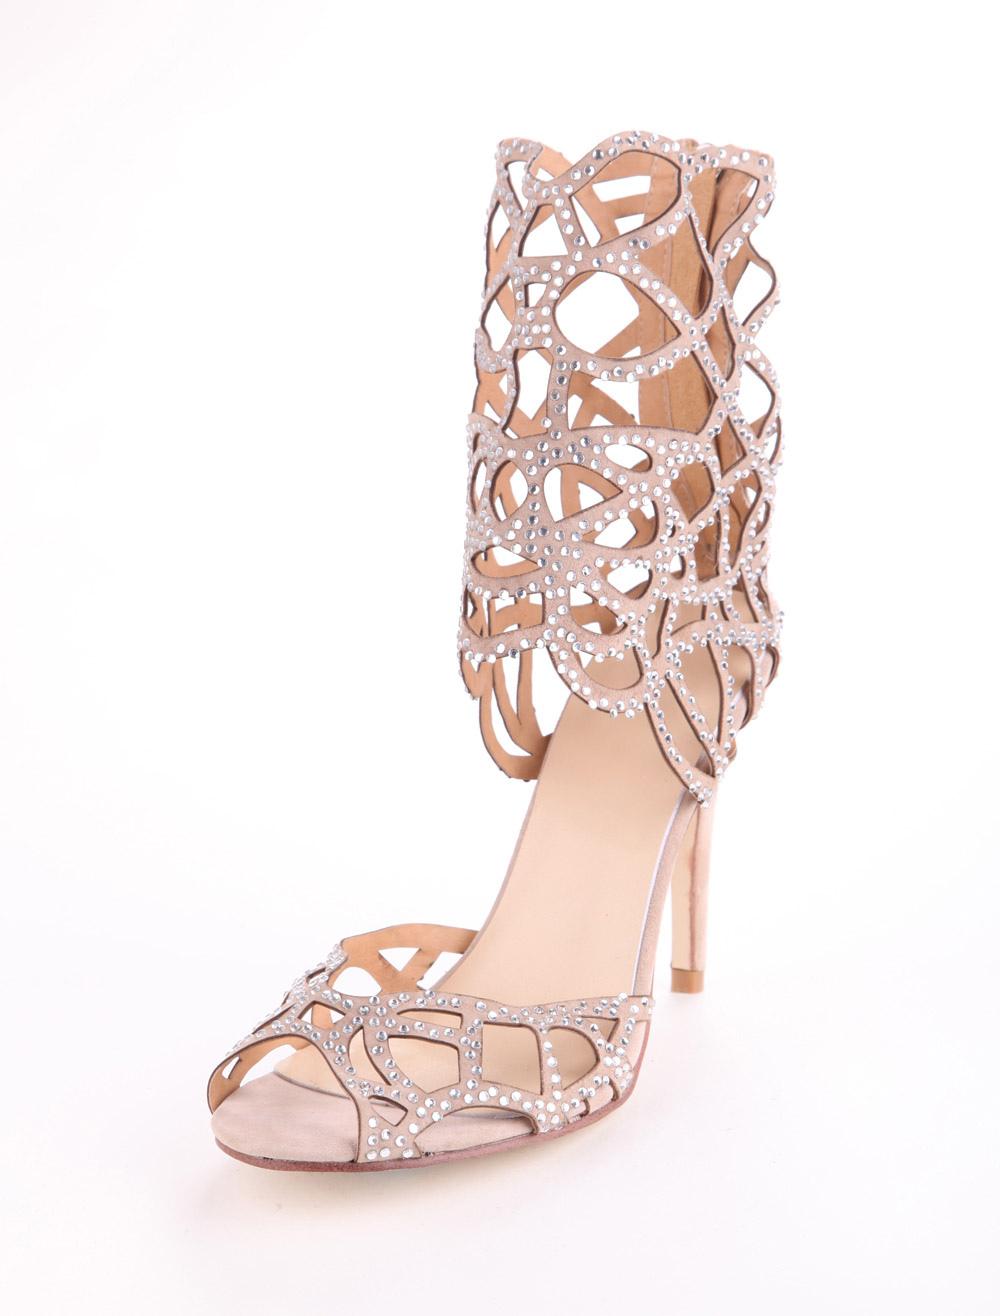 Sheepskin Suede Rhinestone Gladiator Shoes